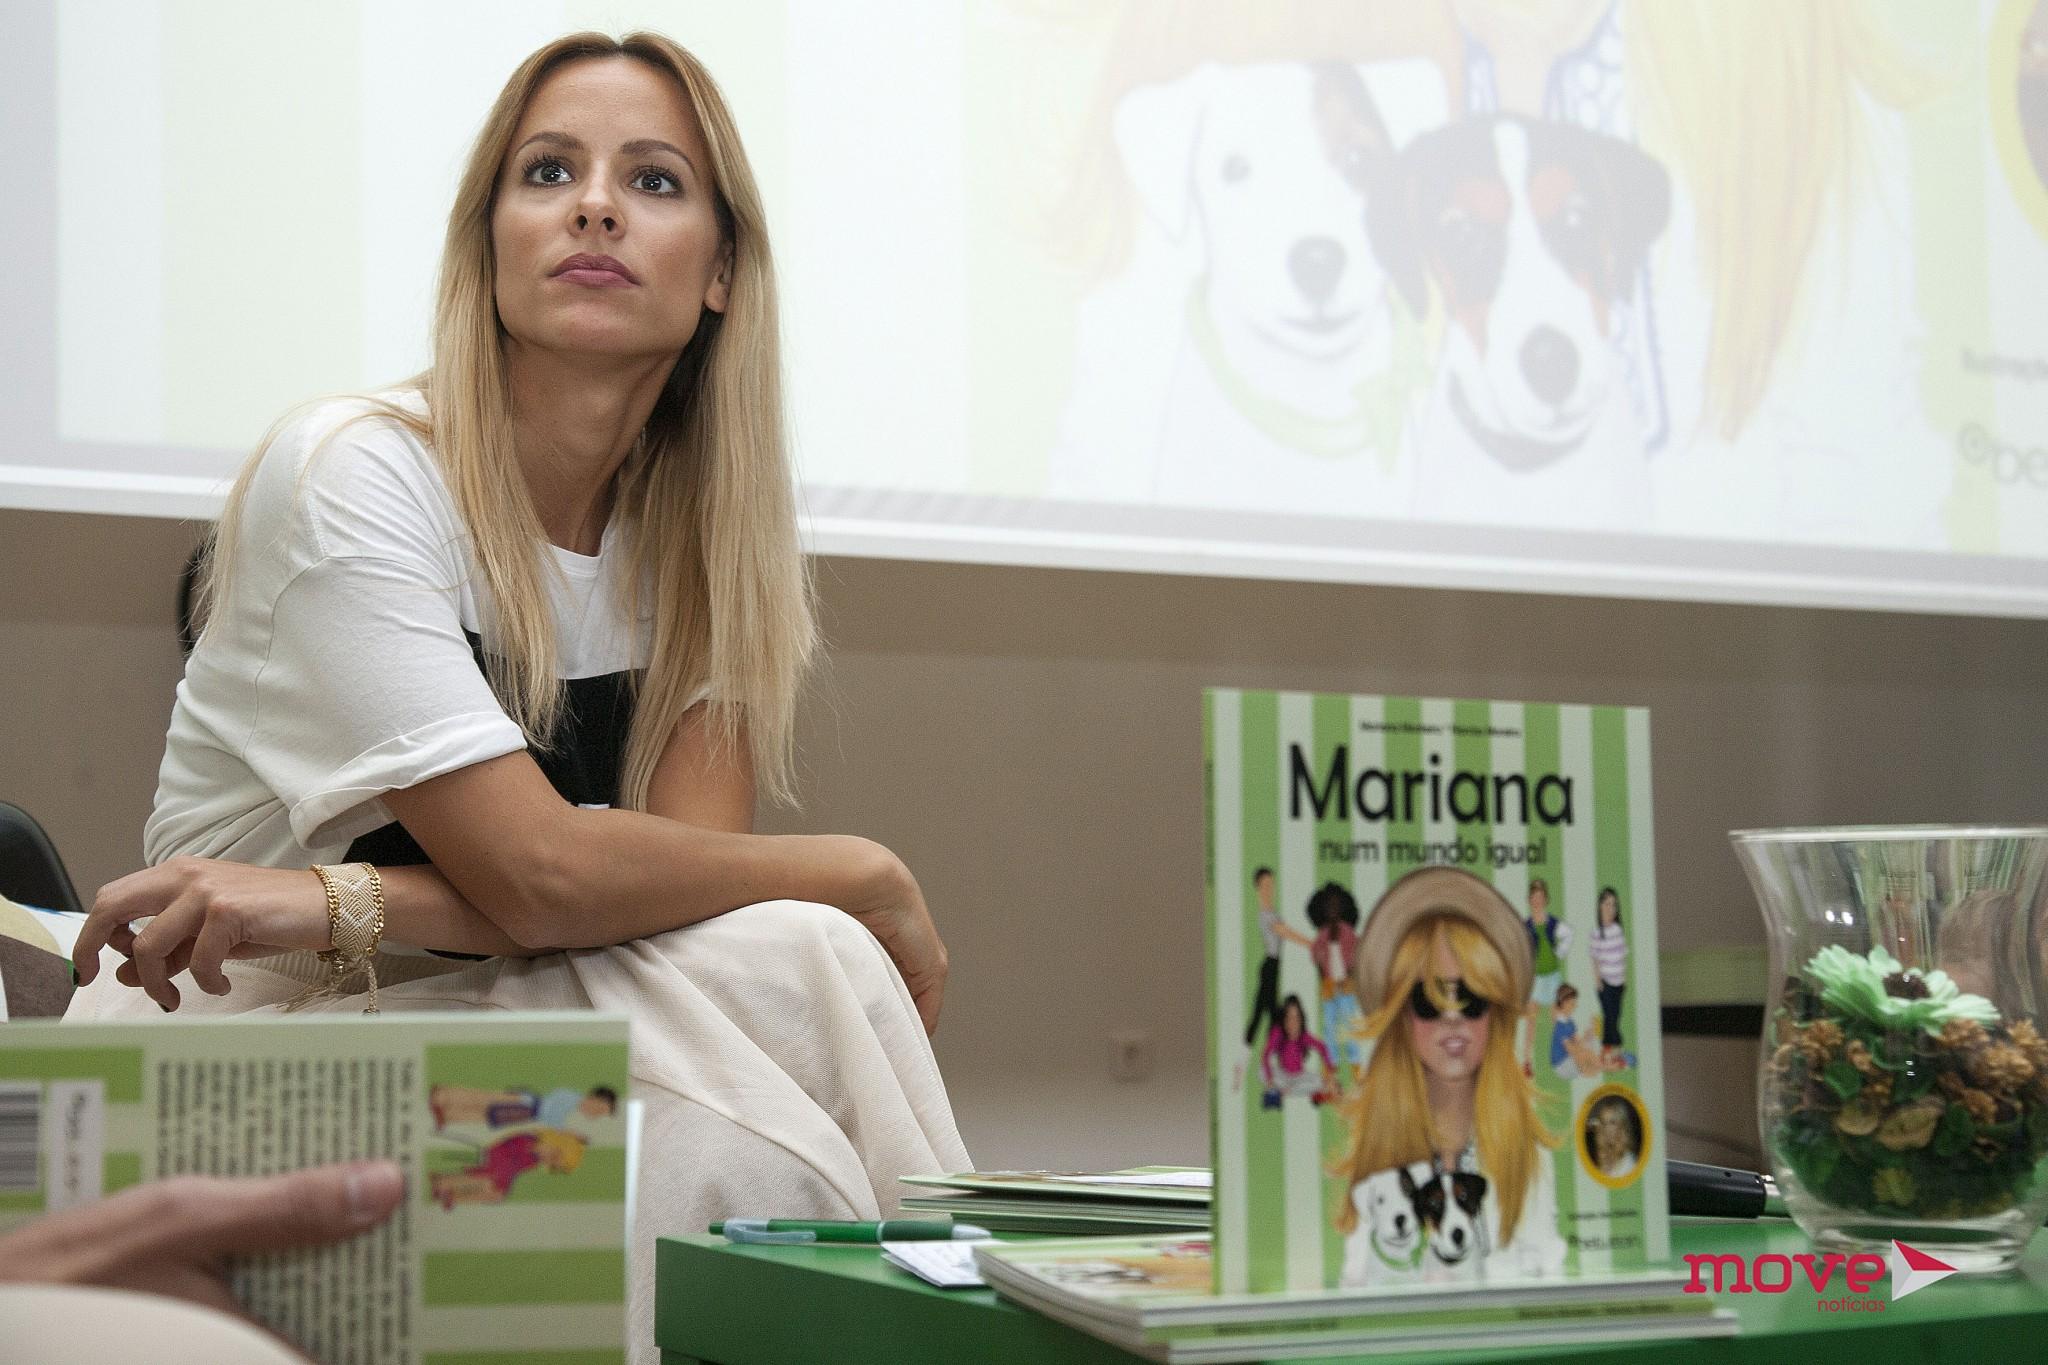 mariana_monteiro24